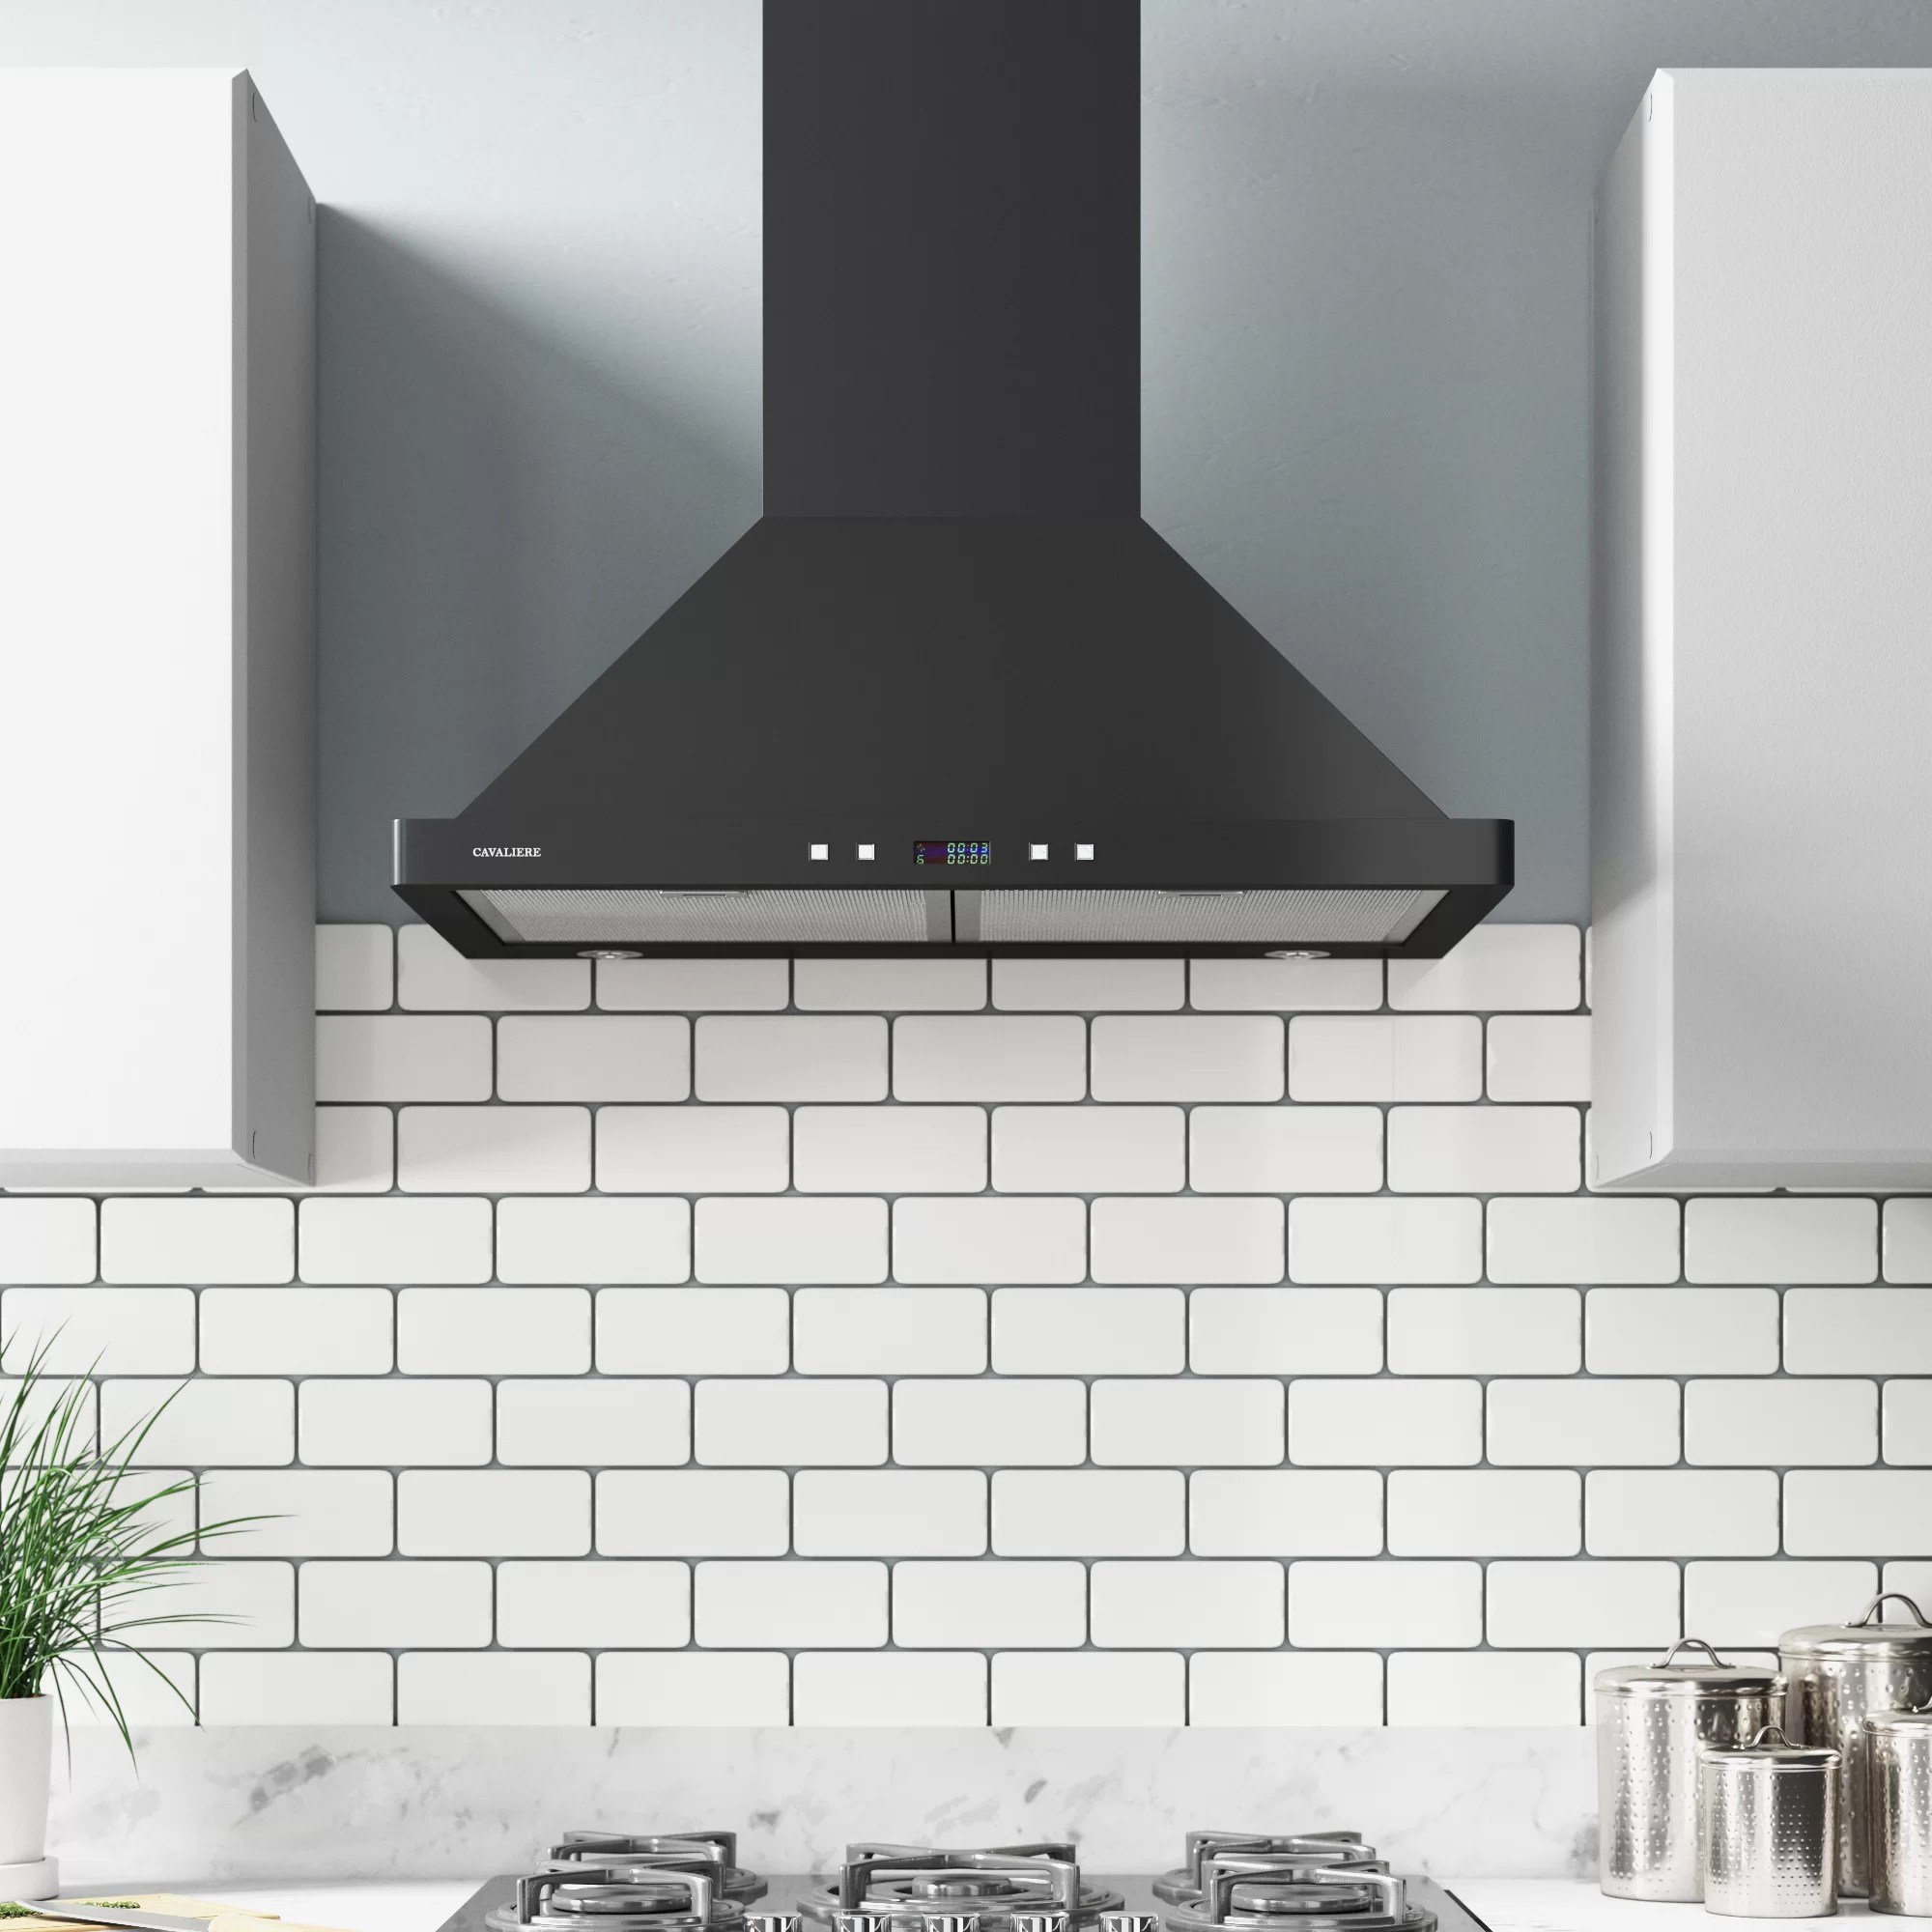 Cavaliere 30 Inch Range Hood Wall Mounted Stainless Steel Kitchen Vent 900 Cfm Range Hoods